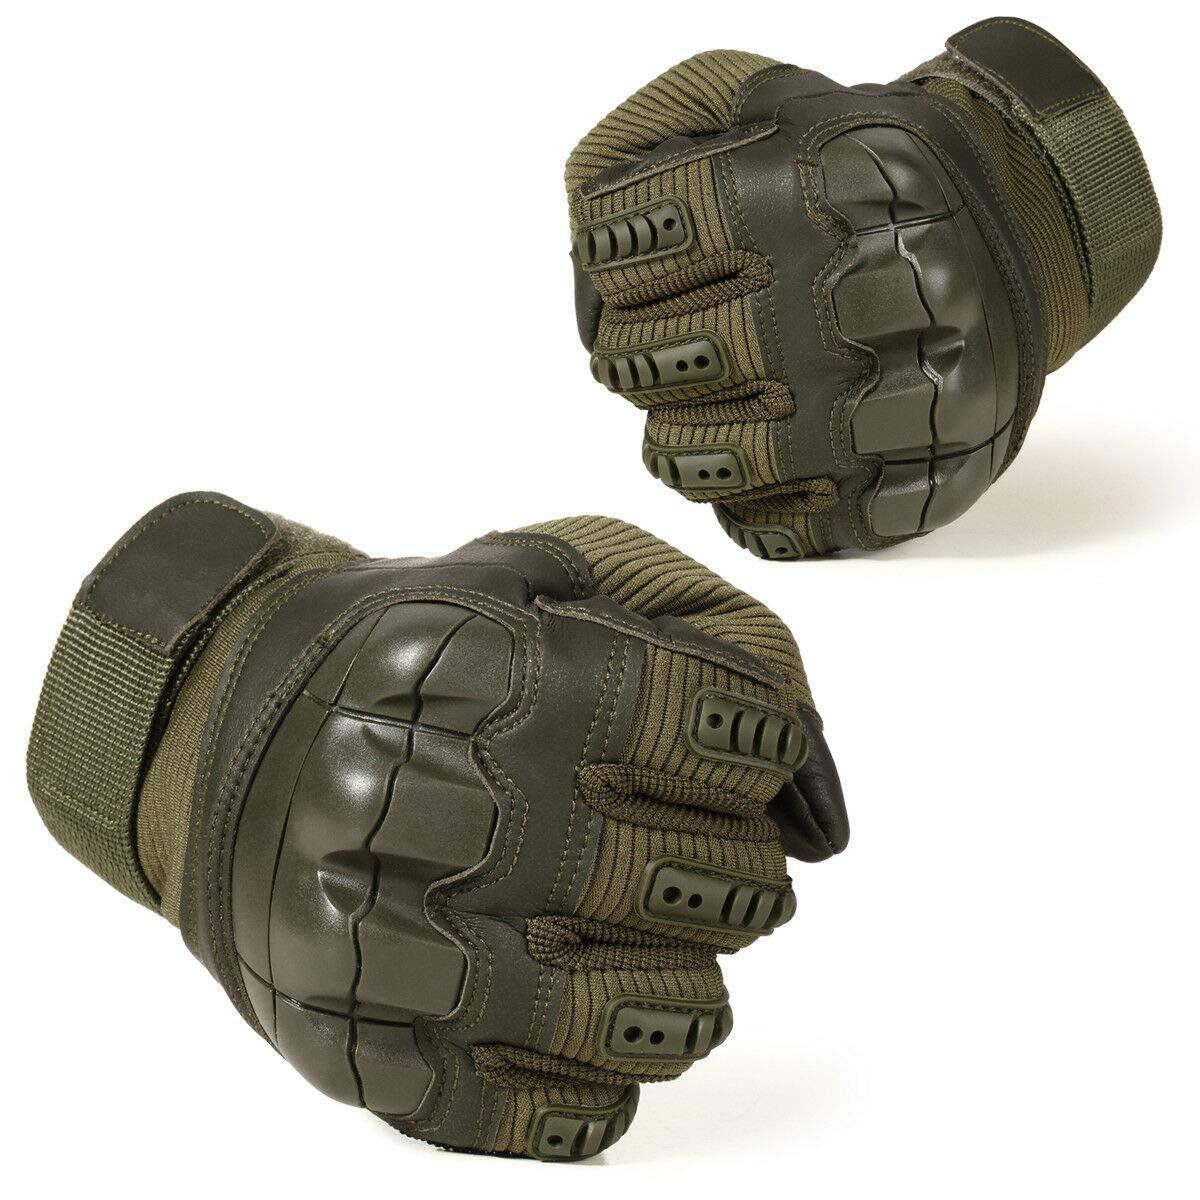 KO-GT6 Vollfinger-Touchscreen Tactical Military Handschuhe Gummi Hard Knuckle Handschuhe f/ür die Jagd Schie/ßen Motorrad Radfahren Wandern Outdoor-Sportarten